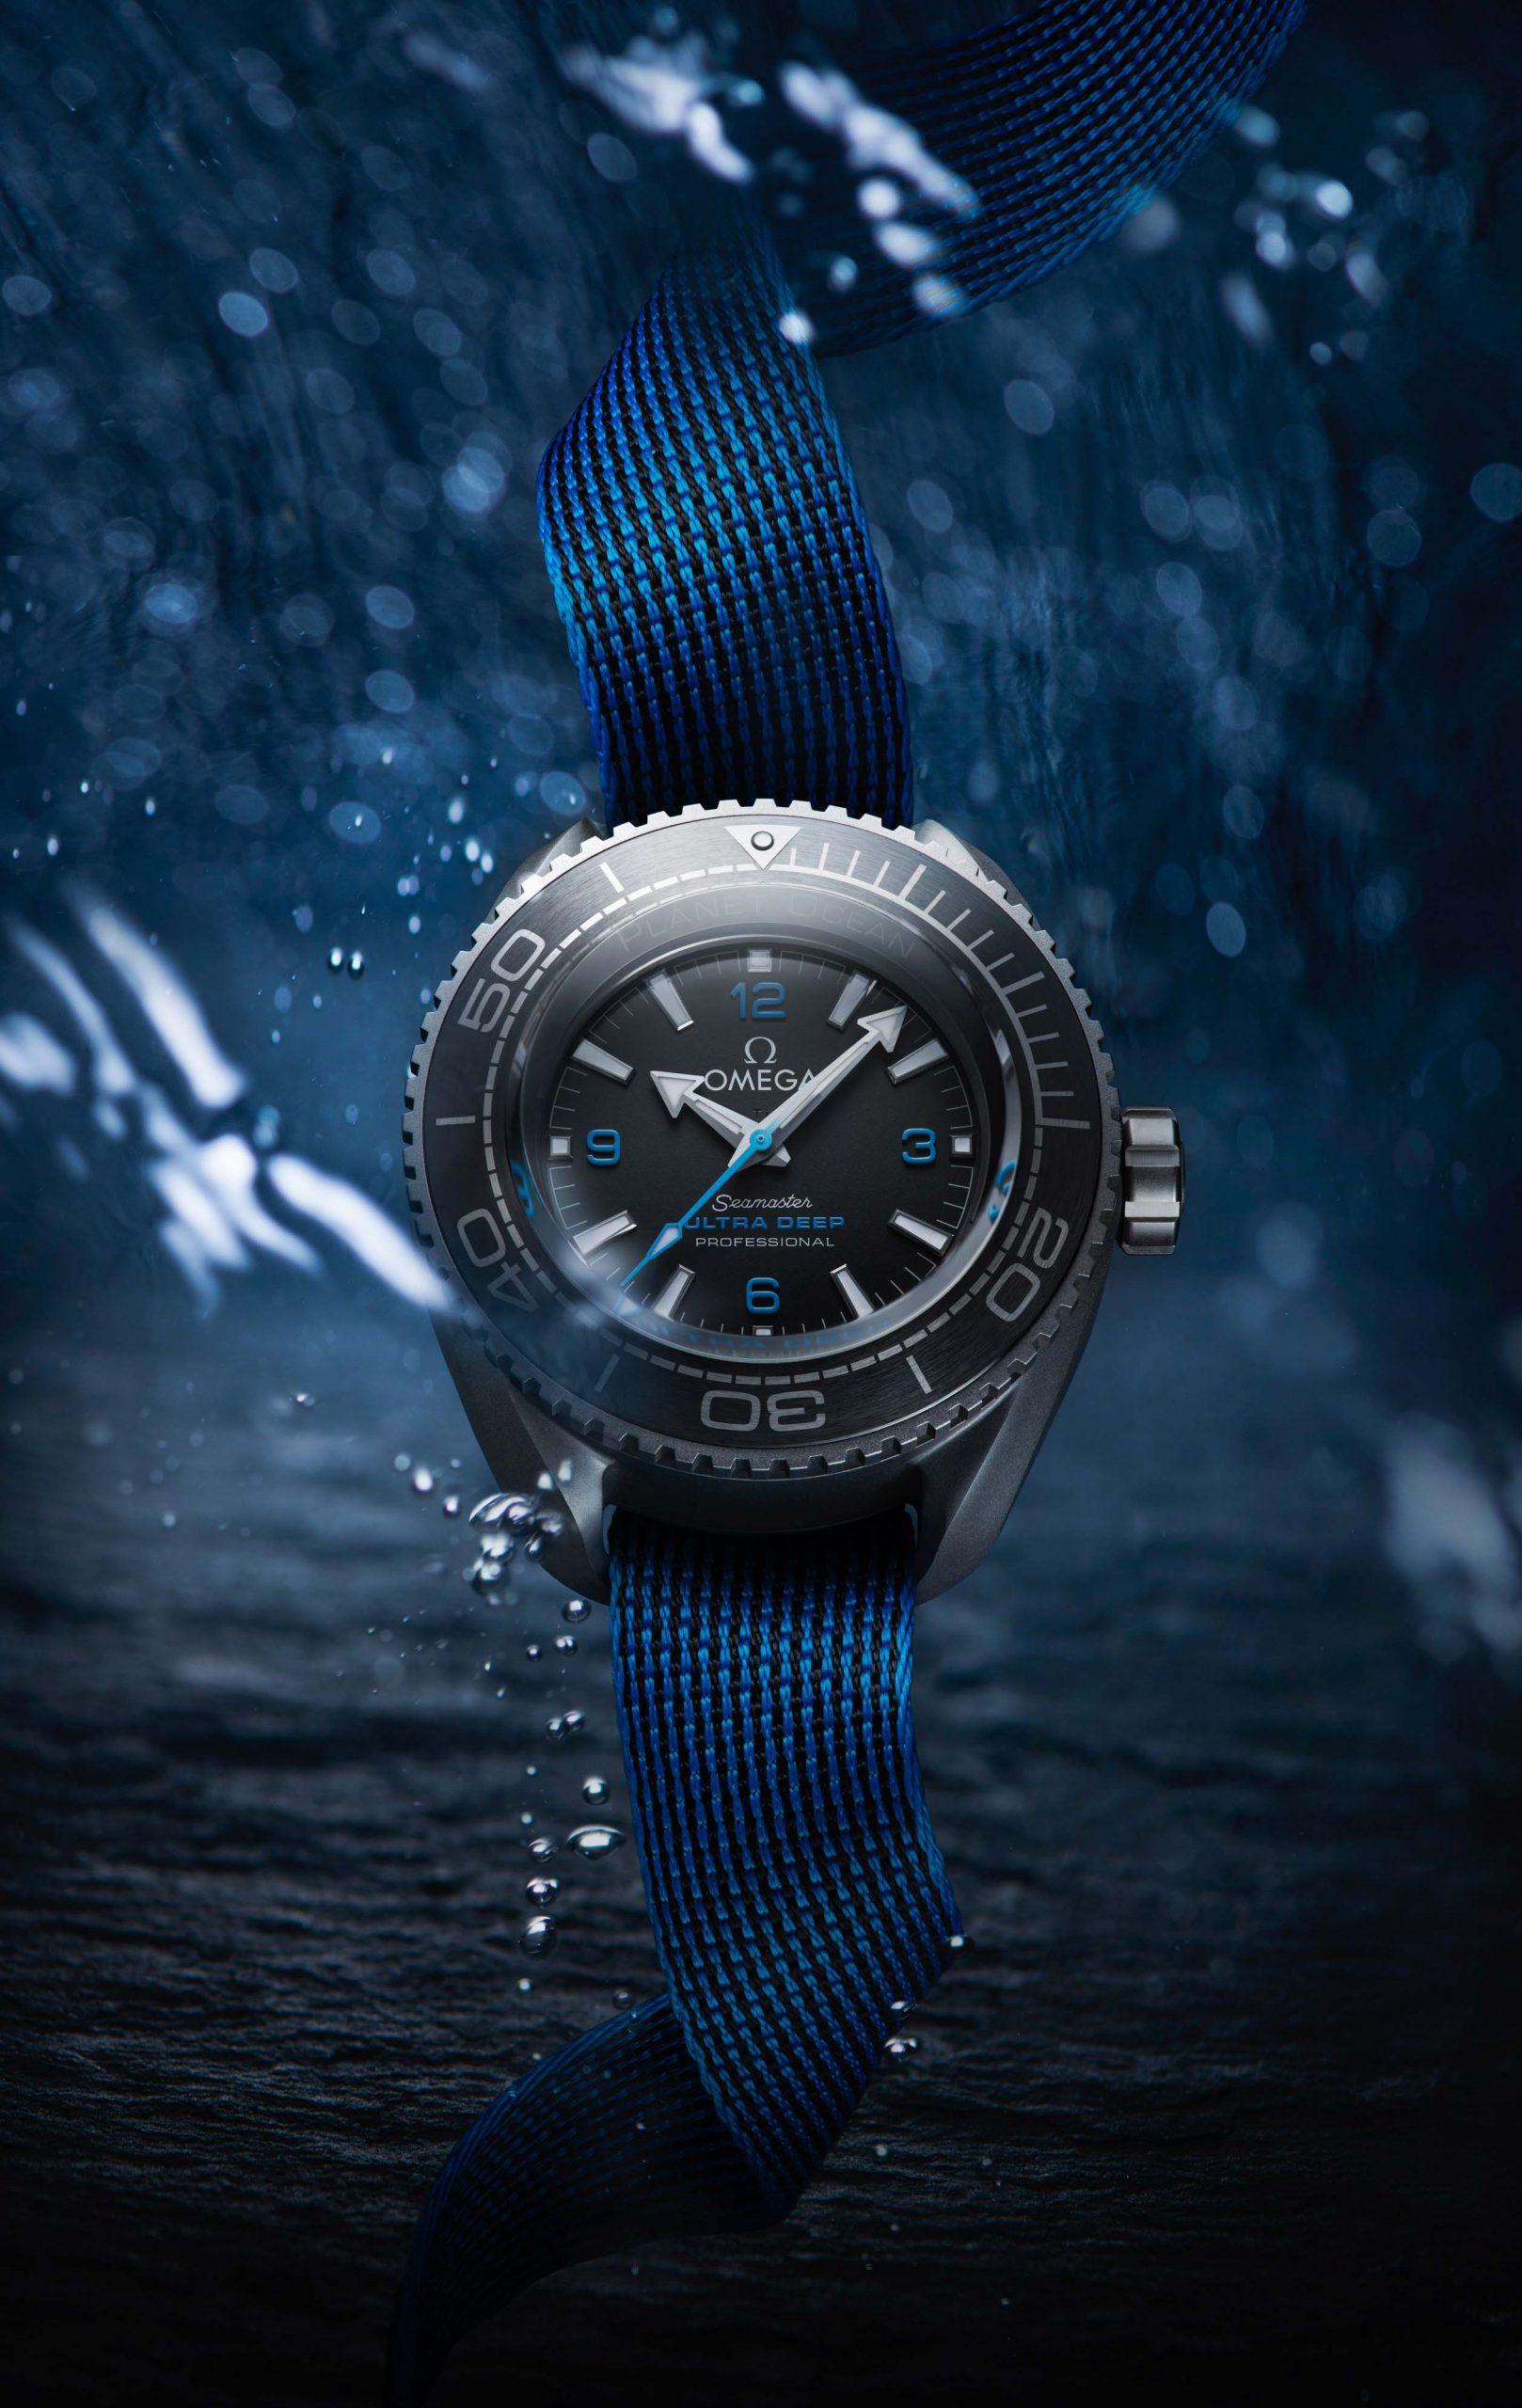 đồng hồ lặn OMEGA Ultra Deep Professional